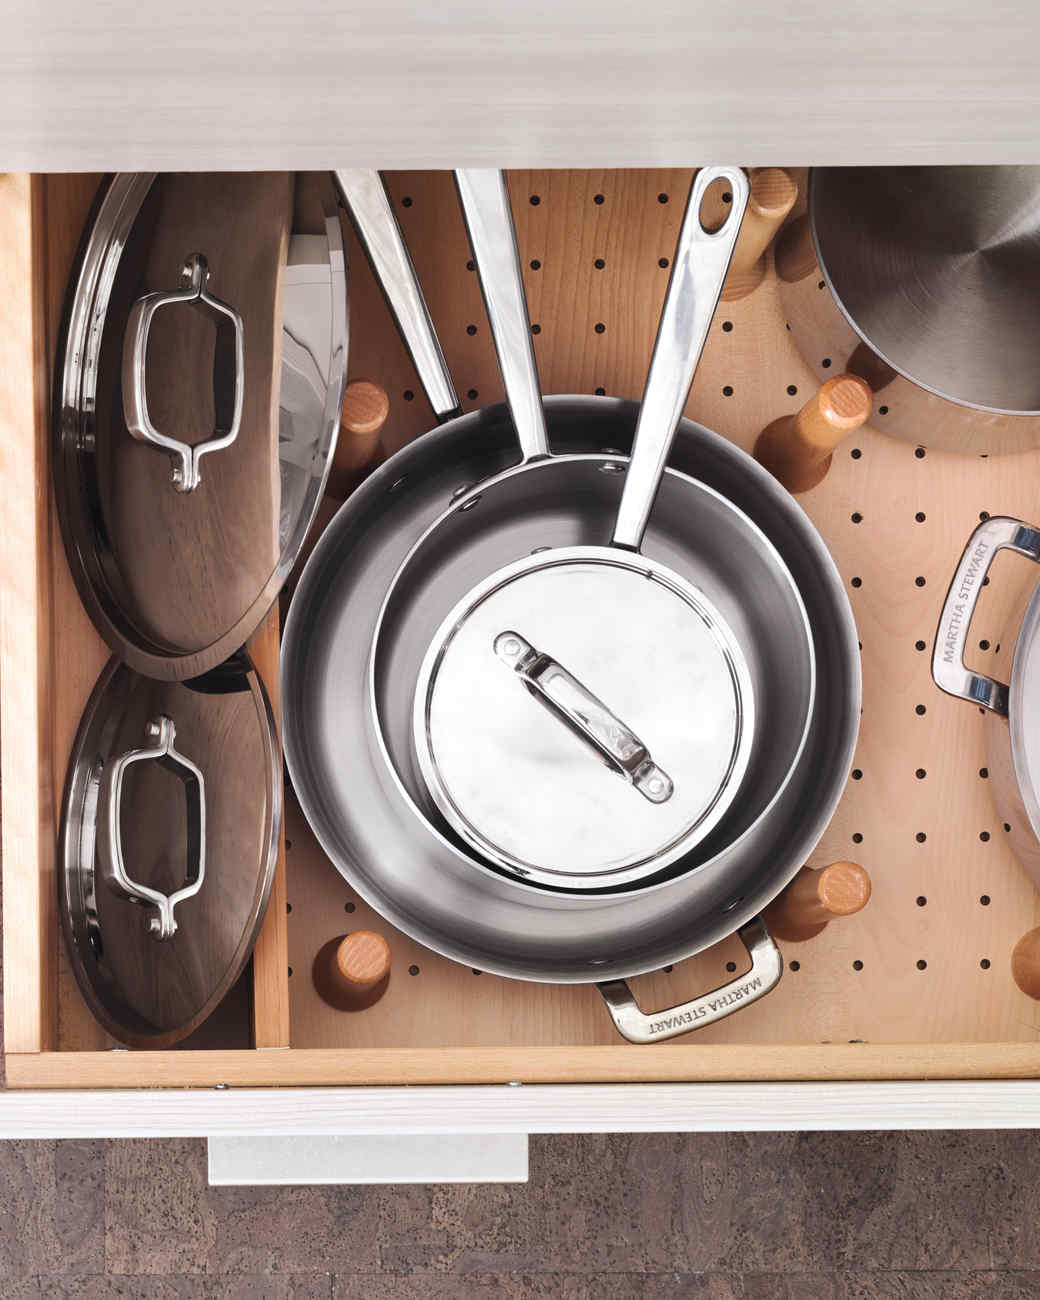 thd-chef-potspans-0315.jpg